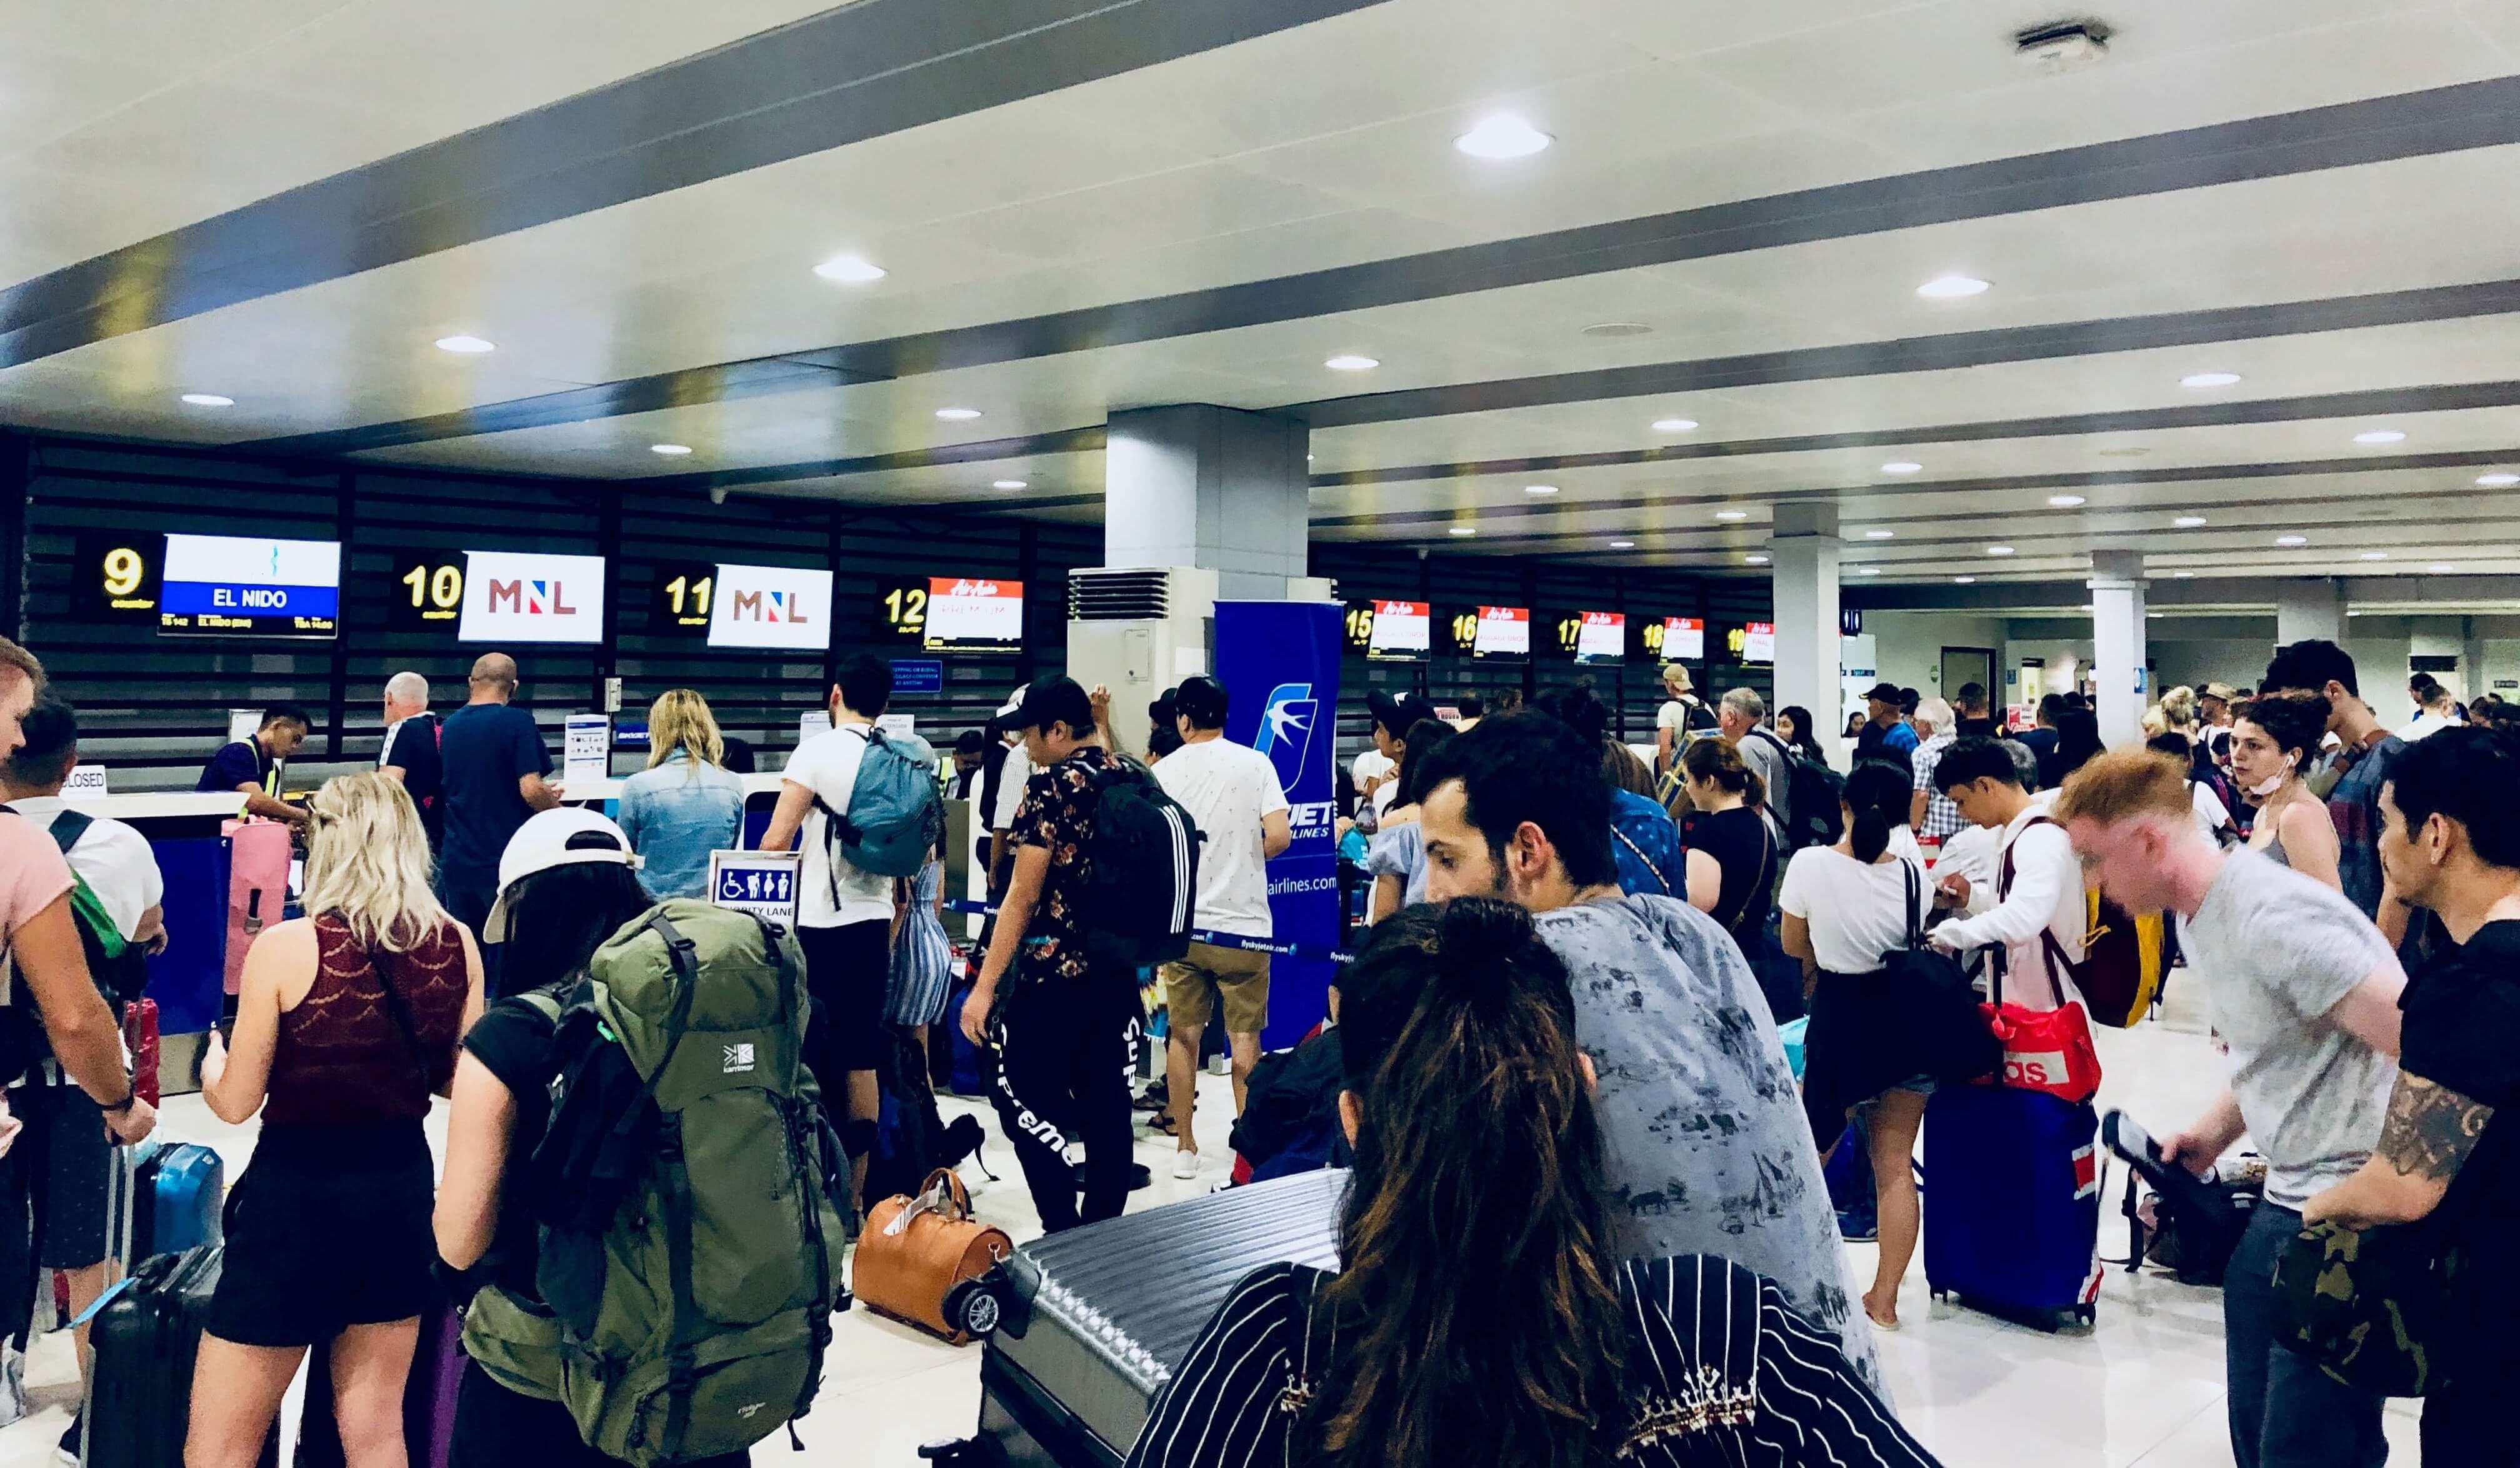 Flughafen Manila Terminal 4